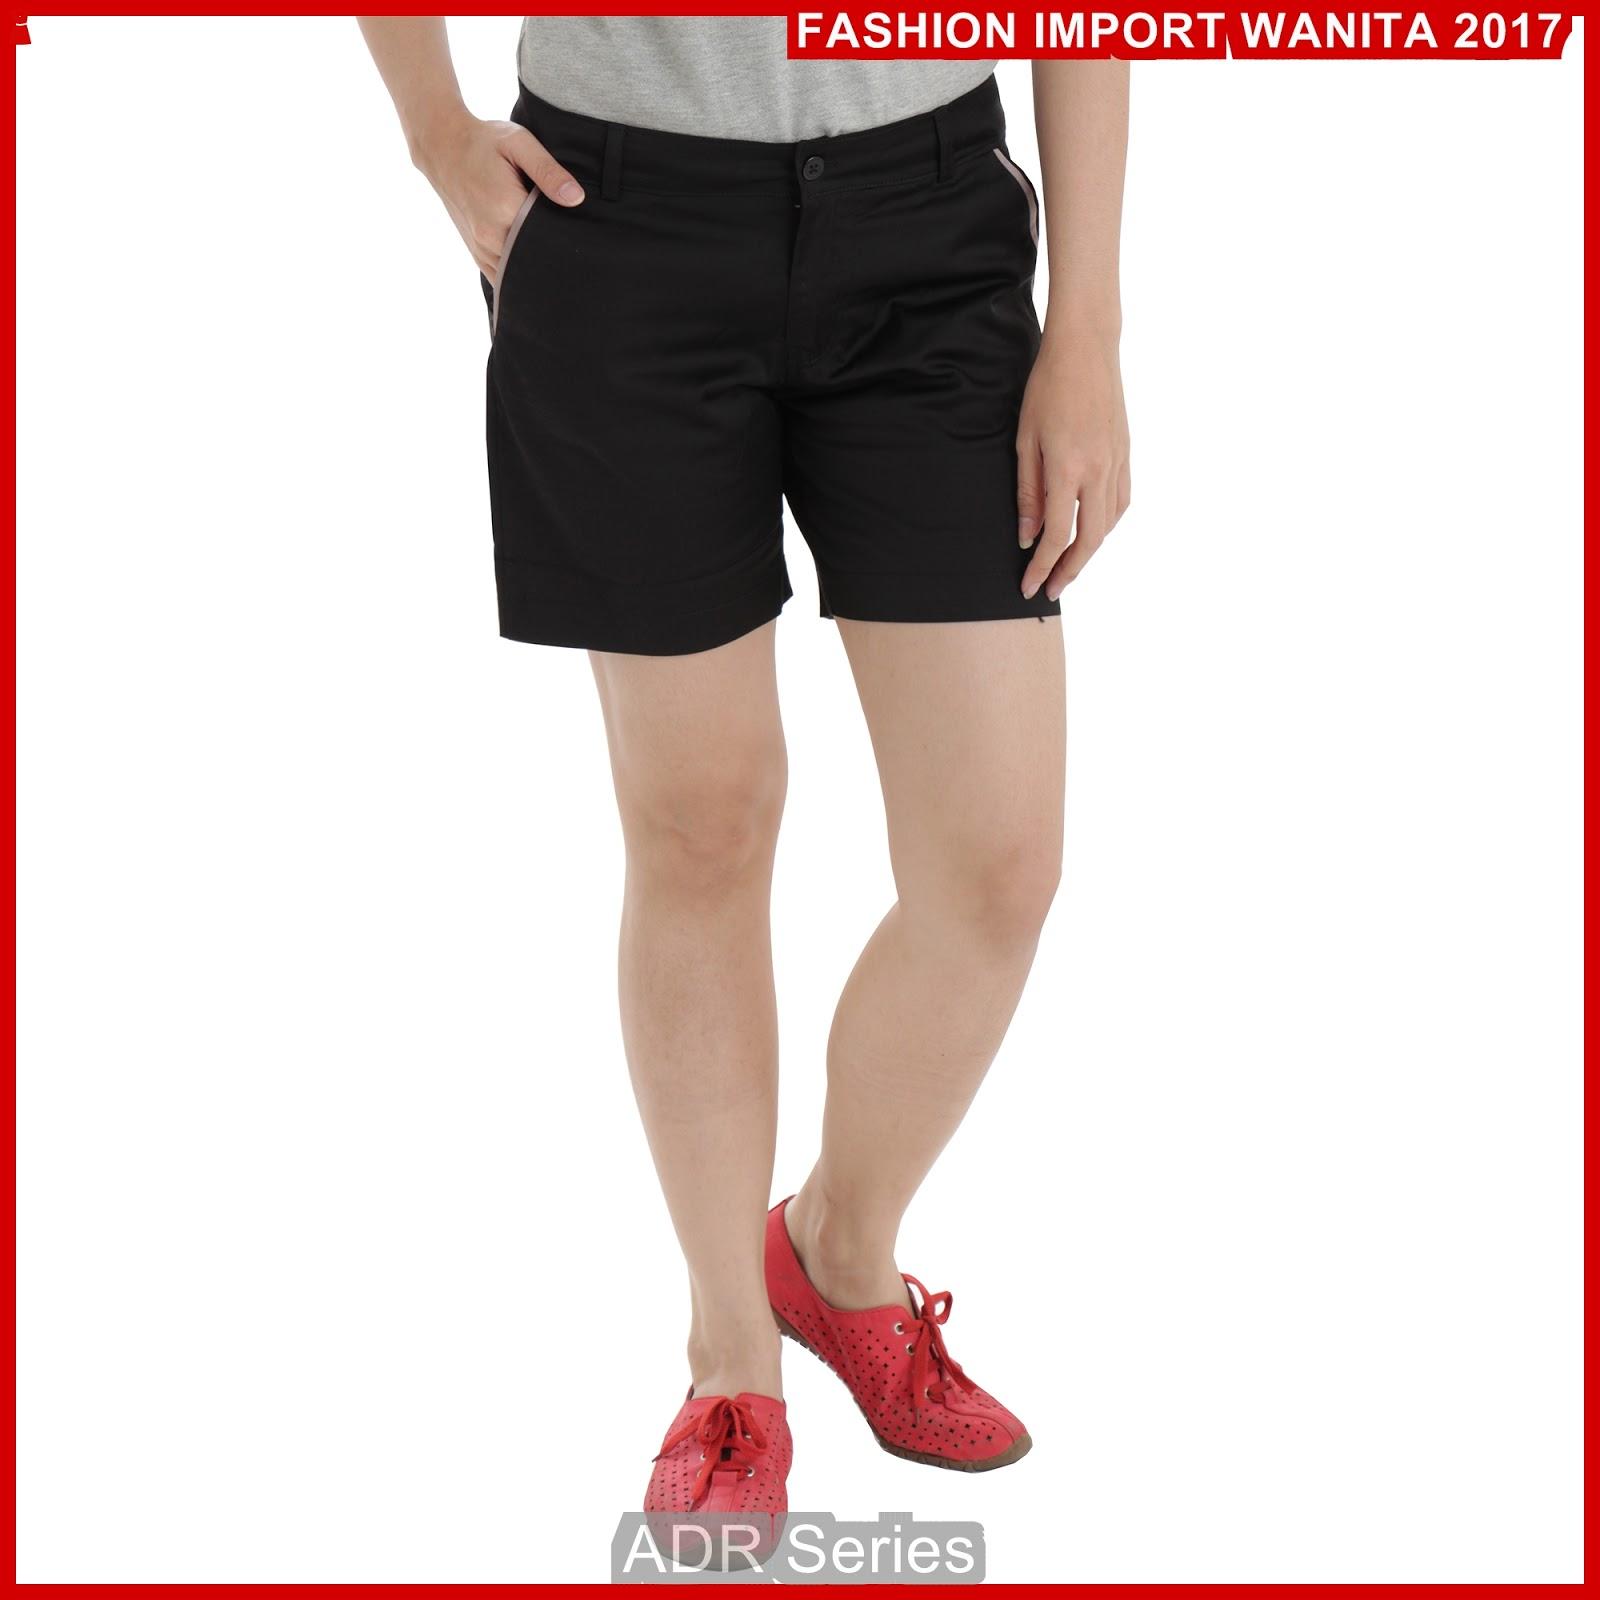 ADR127 Celana Wanita Hitam Pendek Hotpant Import